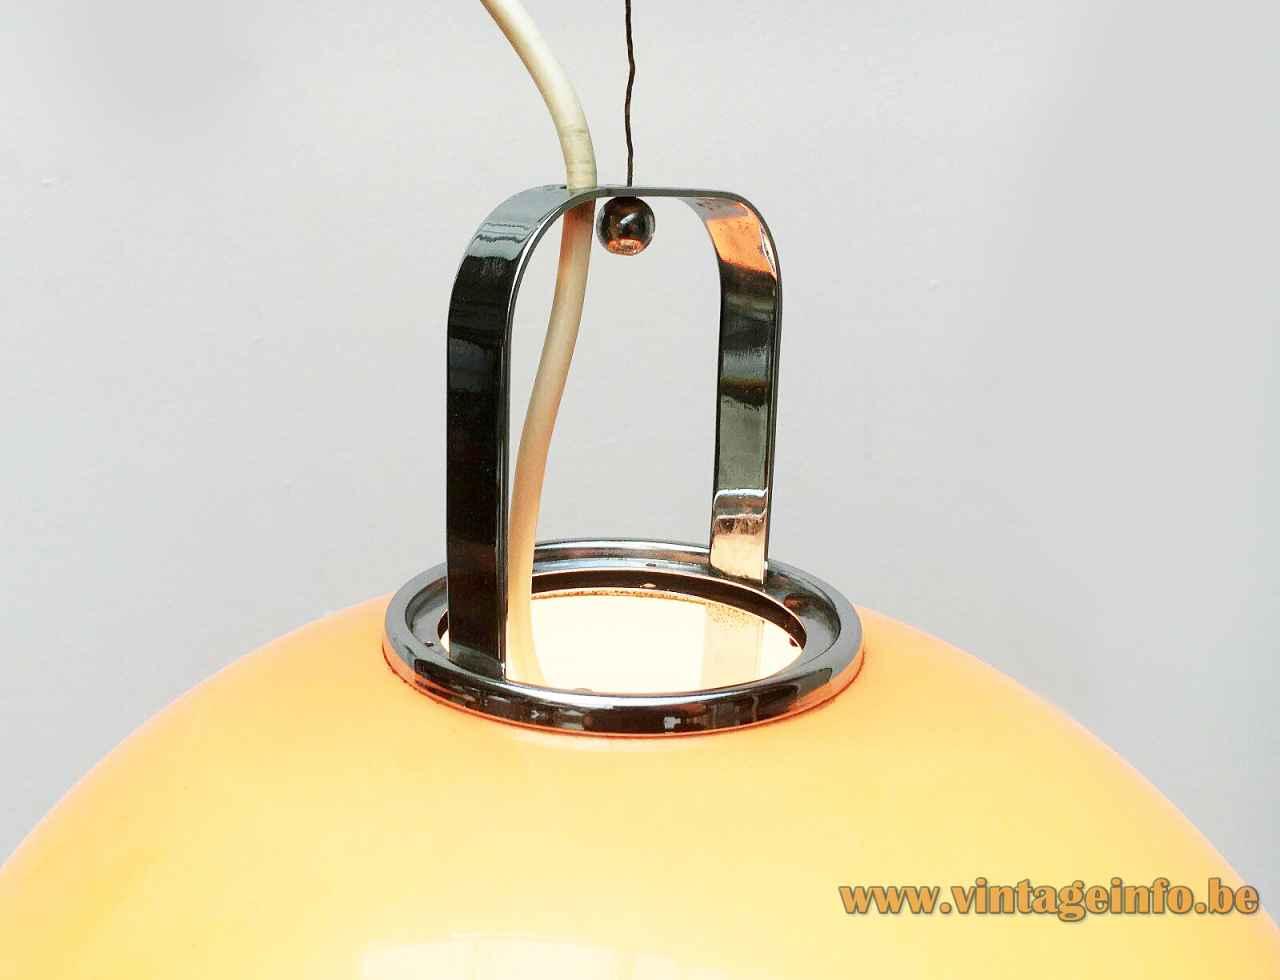 Harvey Guzzini Zurigo pendant lamp orange acrylic globe lampshade chrome handle top view 1960s 1970s Italy